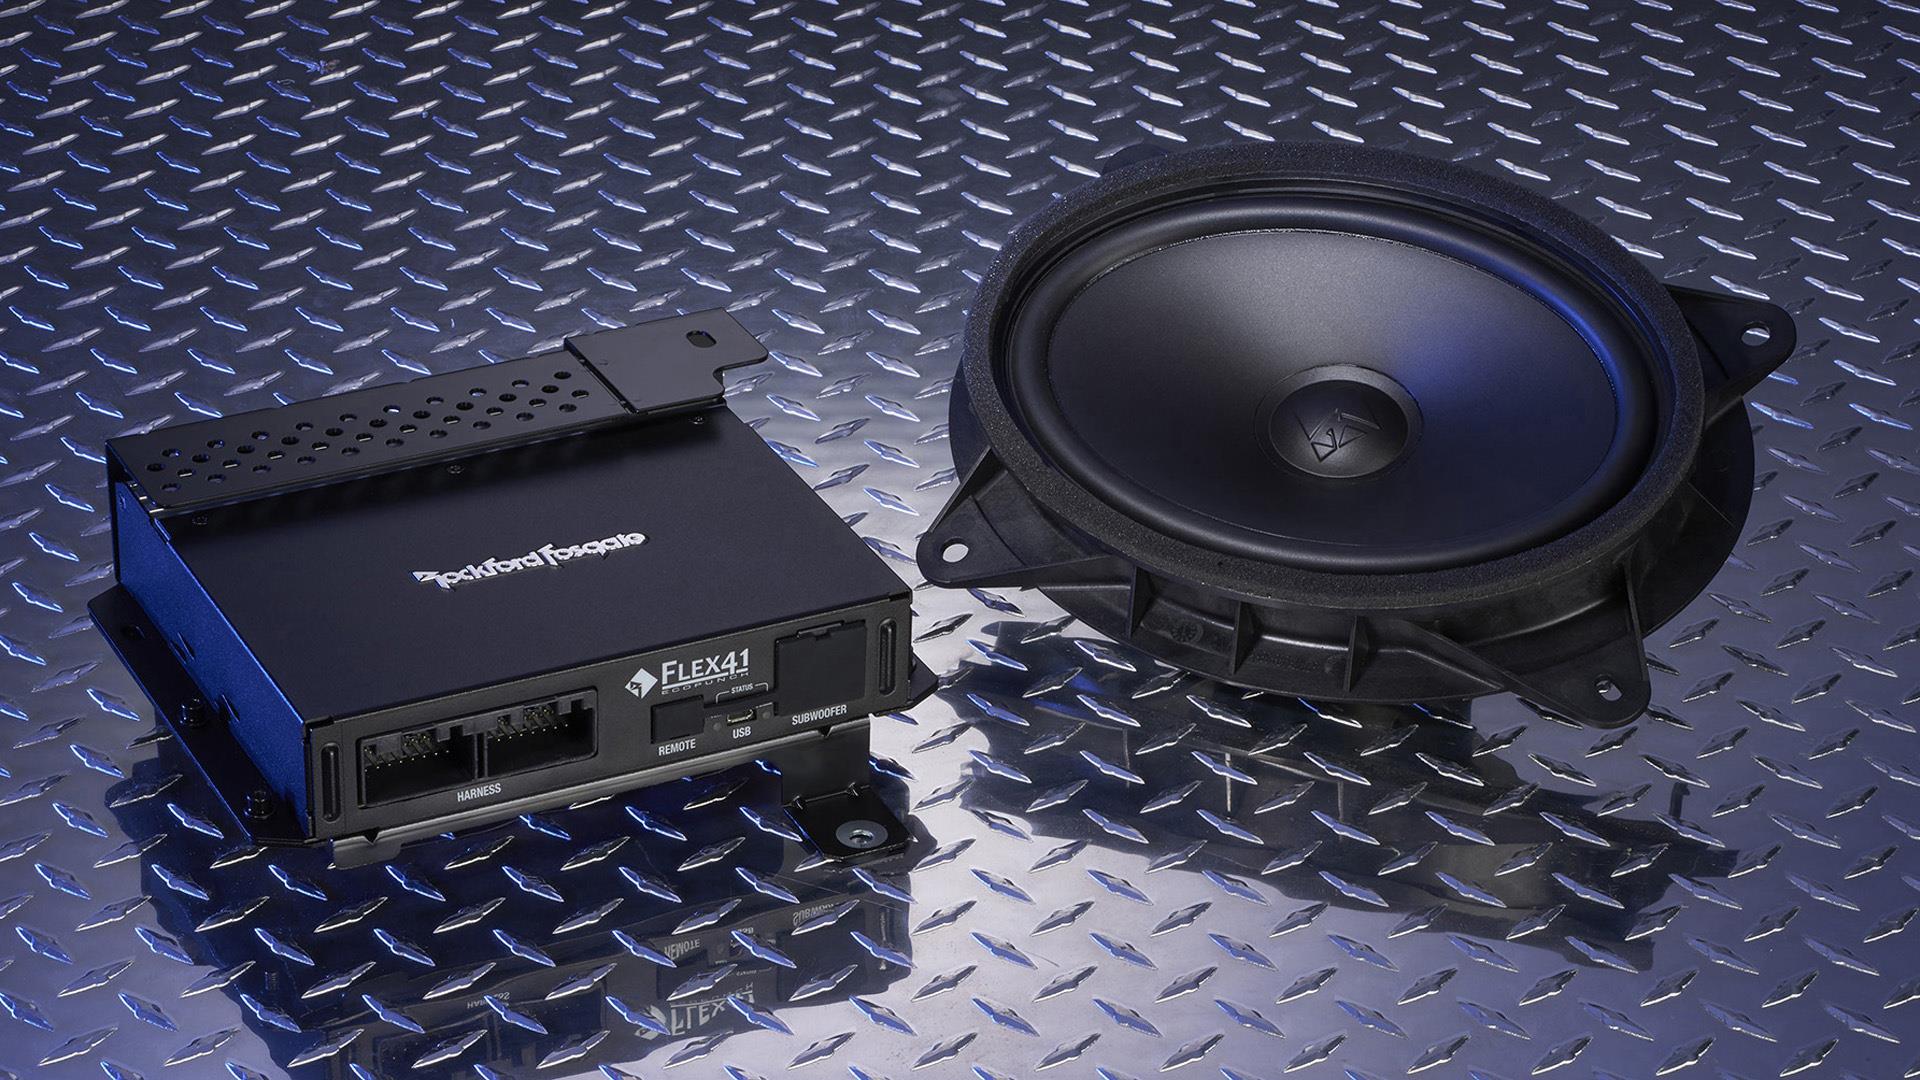 2018 Subaru Impreza Rockford Fosgate Audio Upgrade. System - H630SFL001 - Genuine Subaru Accessory